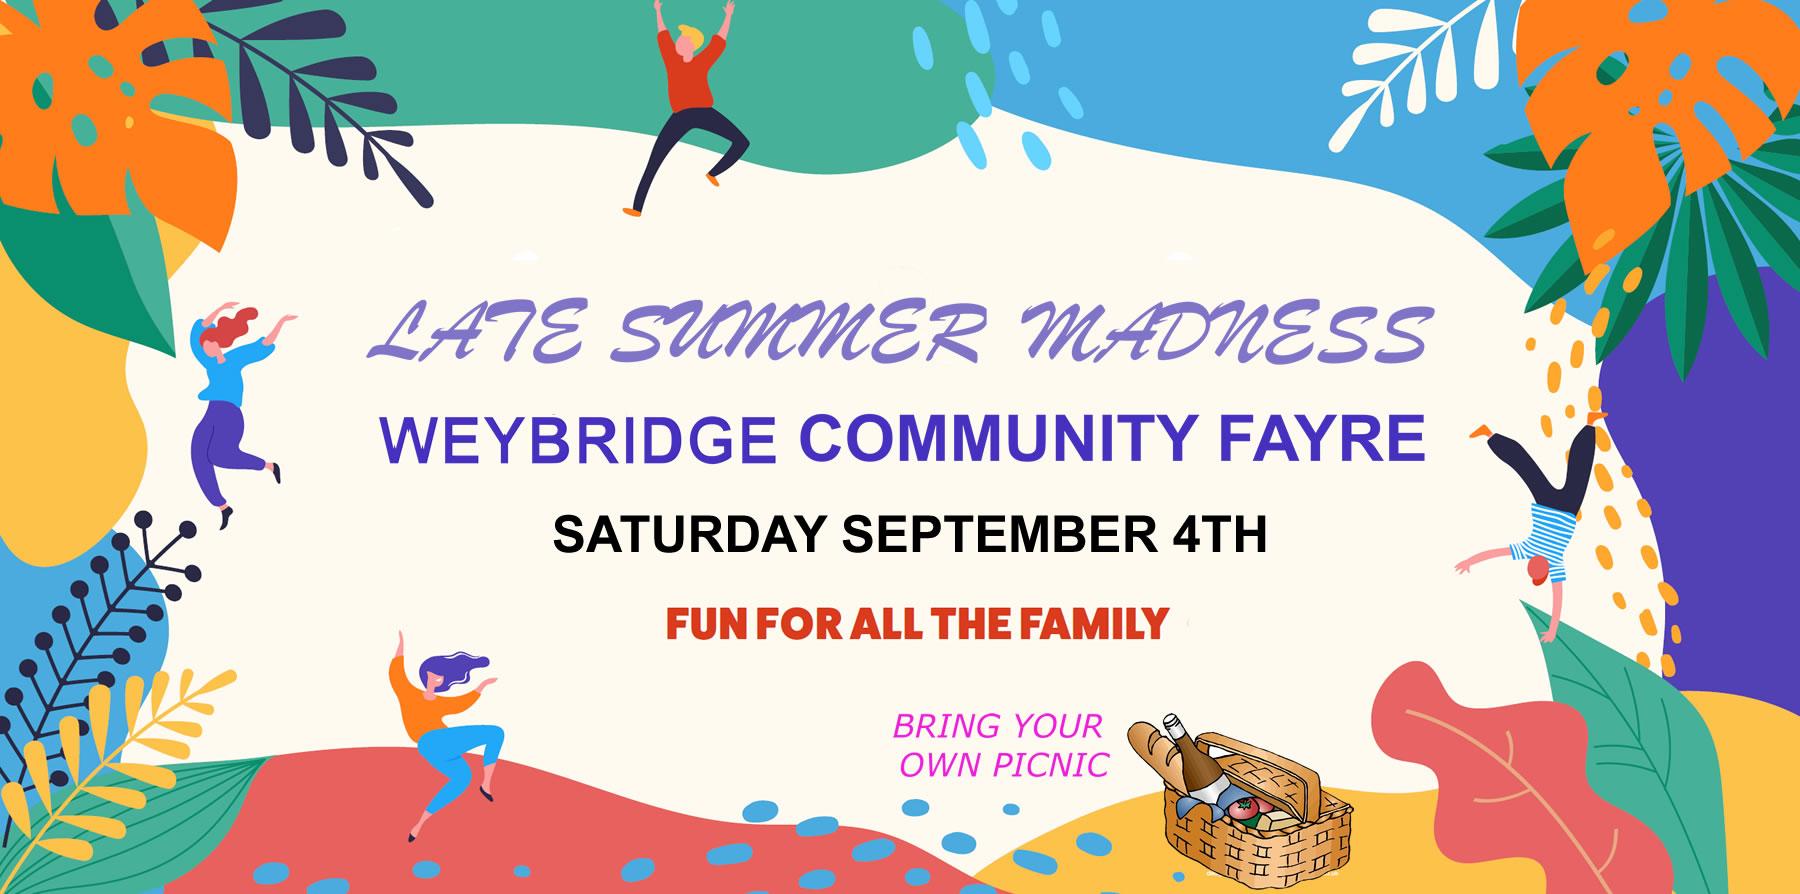 Weybridge Community Fayre - September 2021 - Family fun organised by Weybridge Society